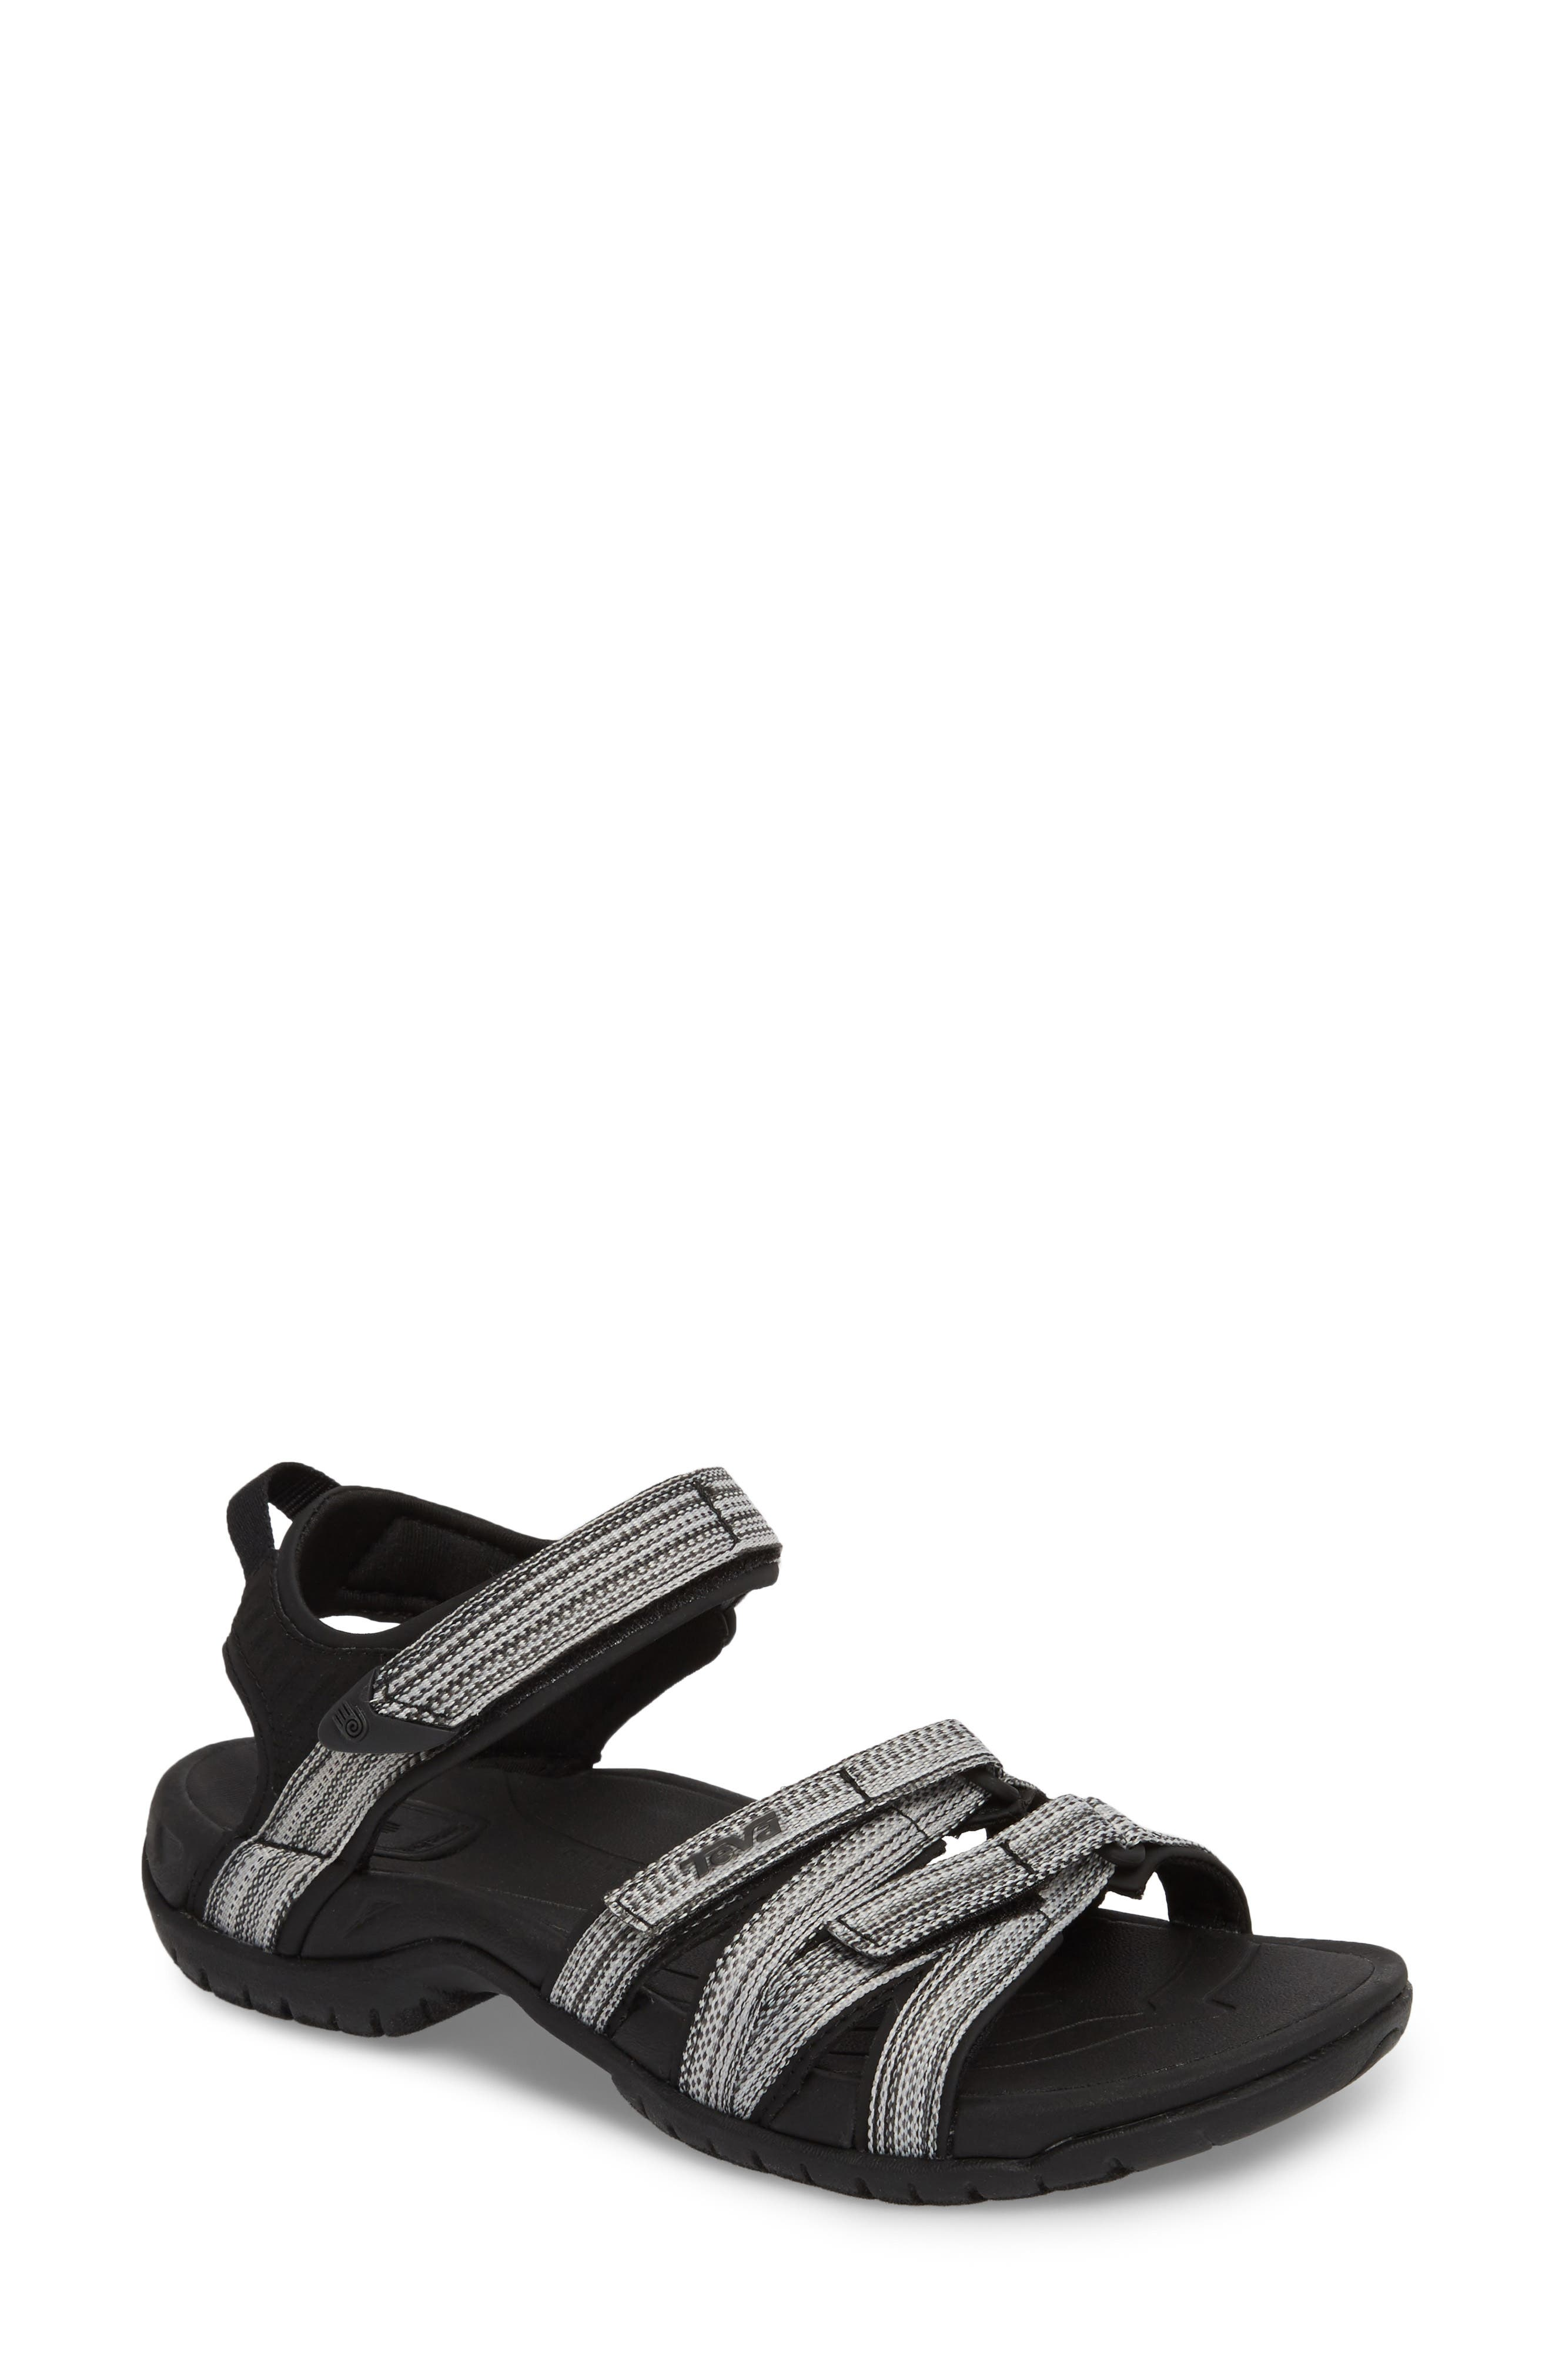 'Tirra' Sandal,                         Main,                         color, 176